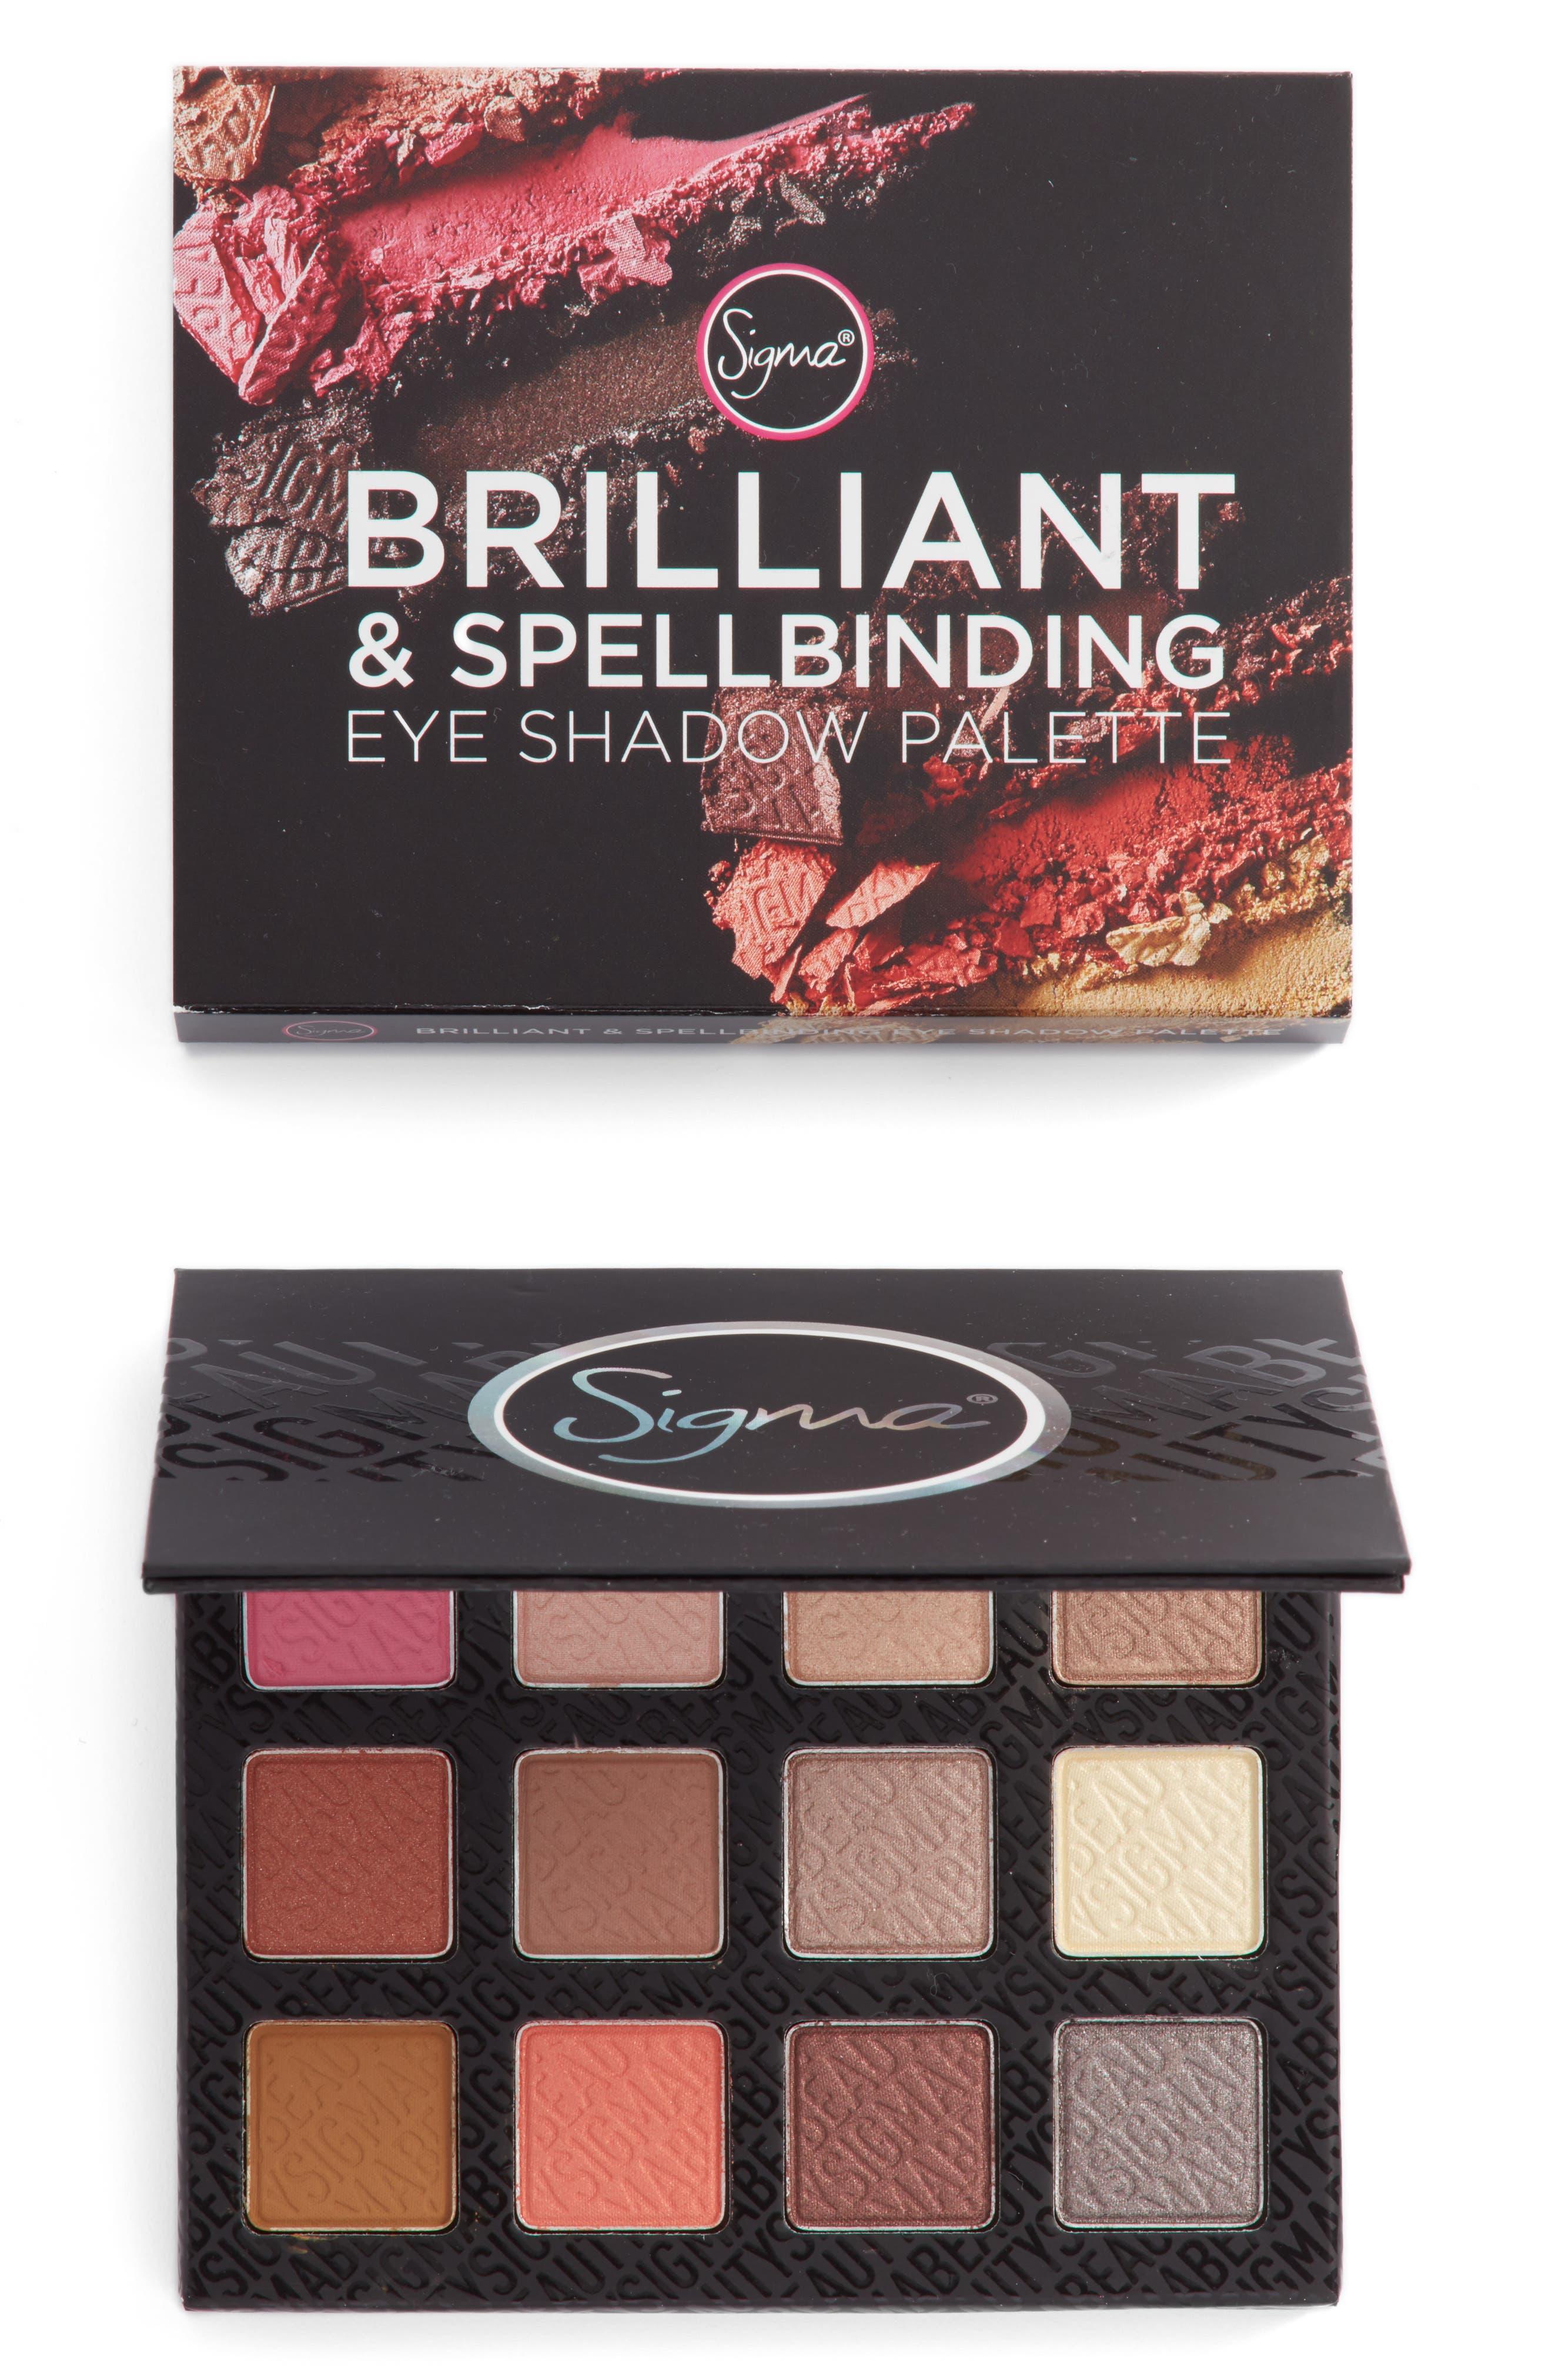 Brilliant & Spellbinding Eyeshadow Palette,                         Main,                         color, No Color